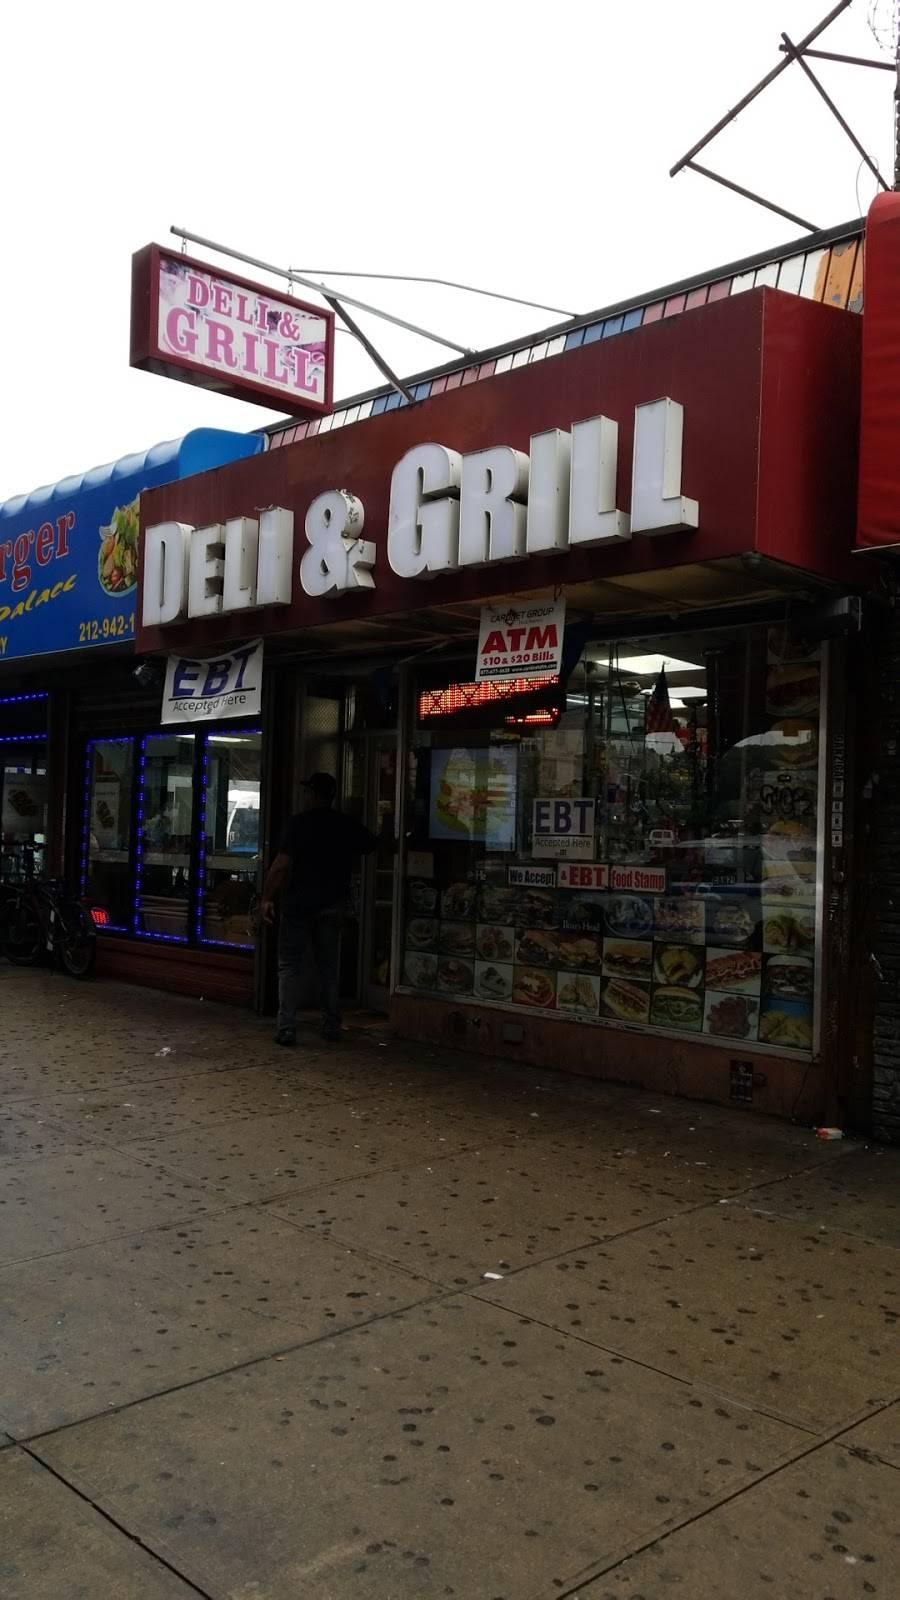 207 Deli & Grill - store  | Photo 1 of 4 | Address: 3867 10th Ave, New York, NY 10034, USA | Phone: (212) 544-2544